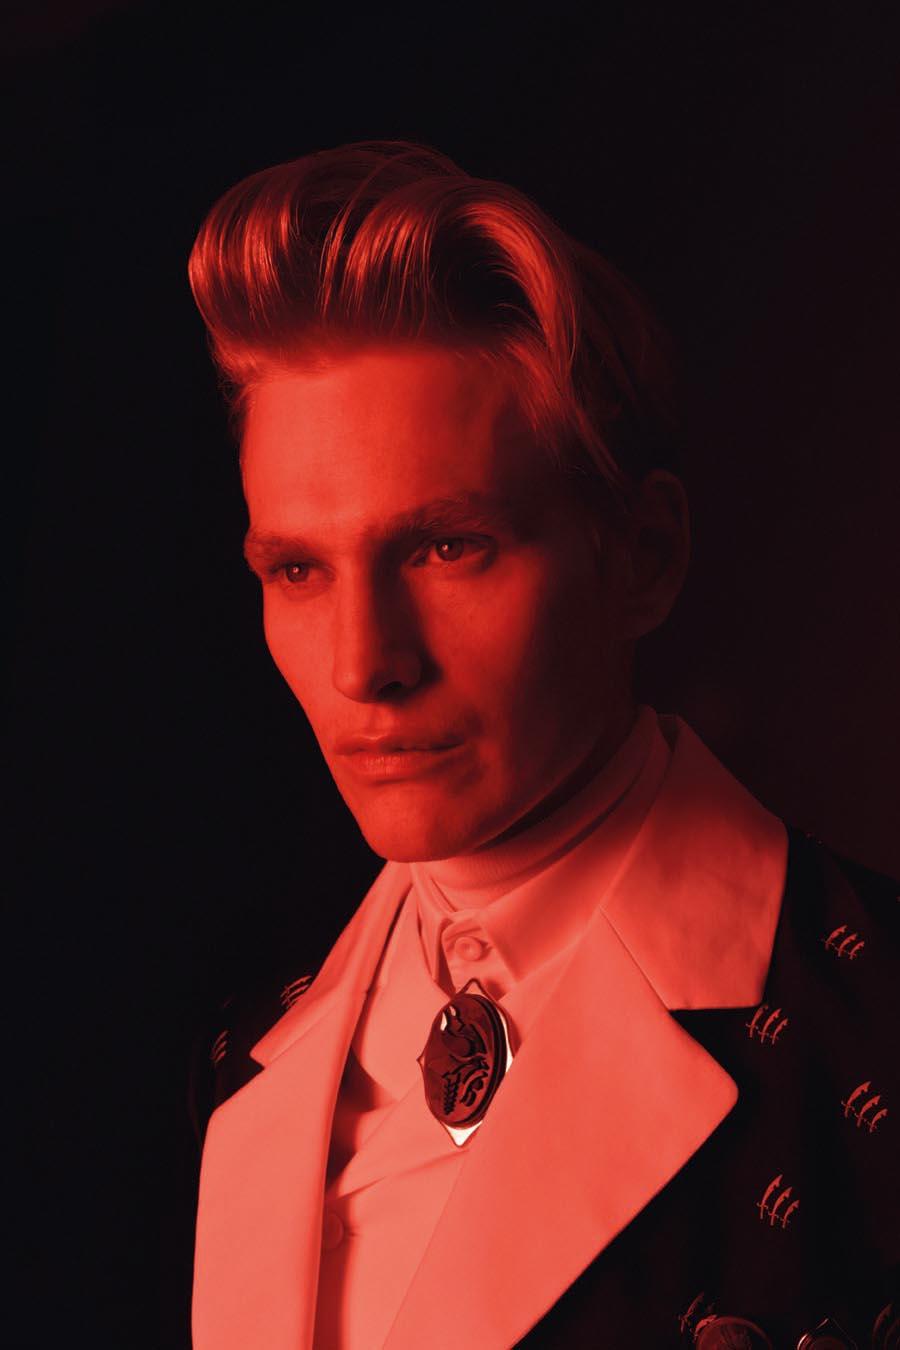 Gerhard Freidl0329_VIKTOR Magazine_Ph Adriano Russo(Wiener Models)